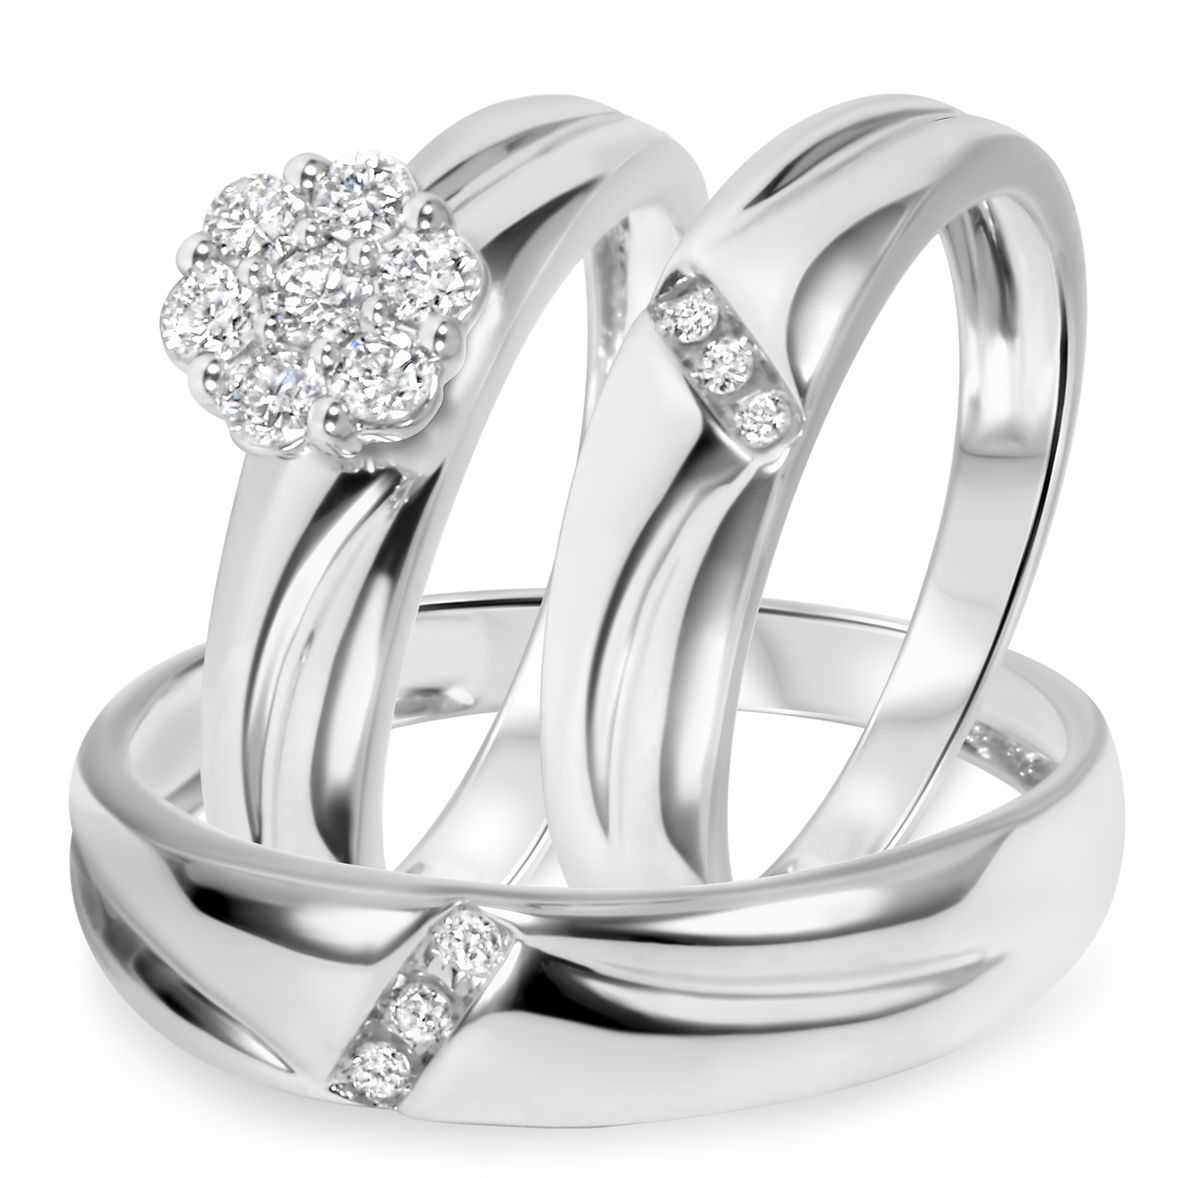 tw diamond trio matching wedding ring set 14k white gold - Trio Wedding Ring Sets